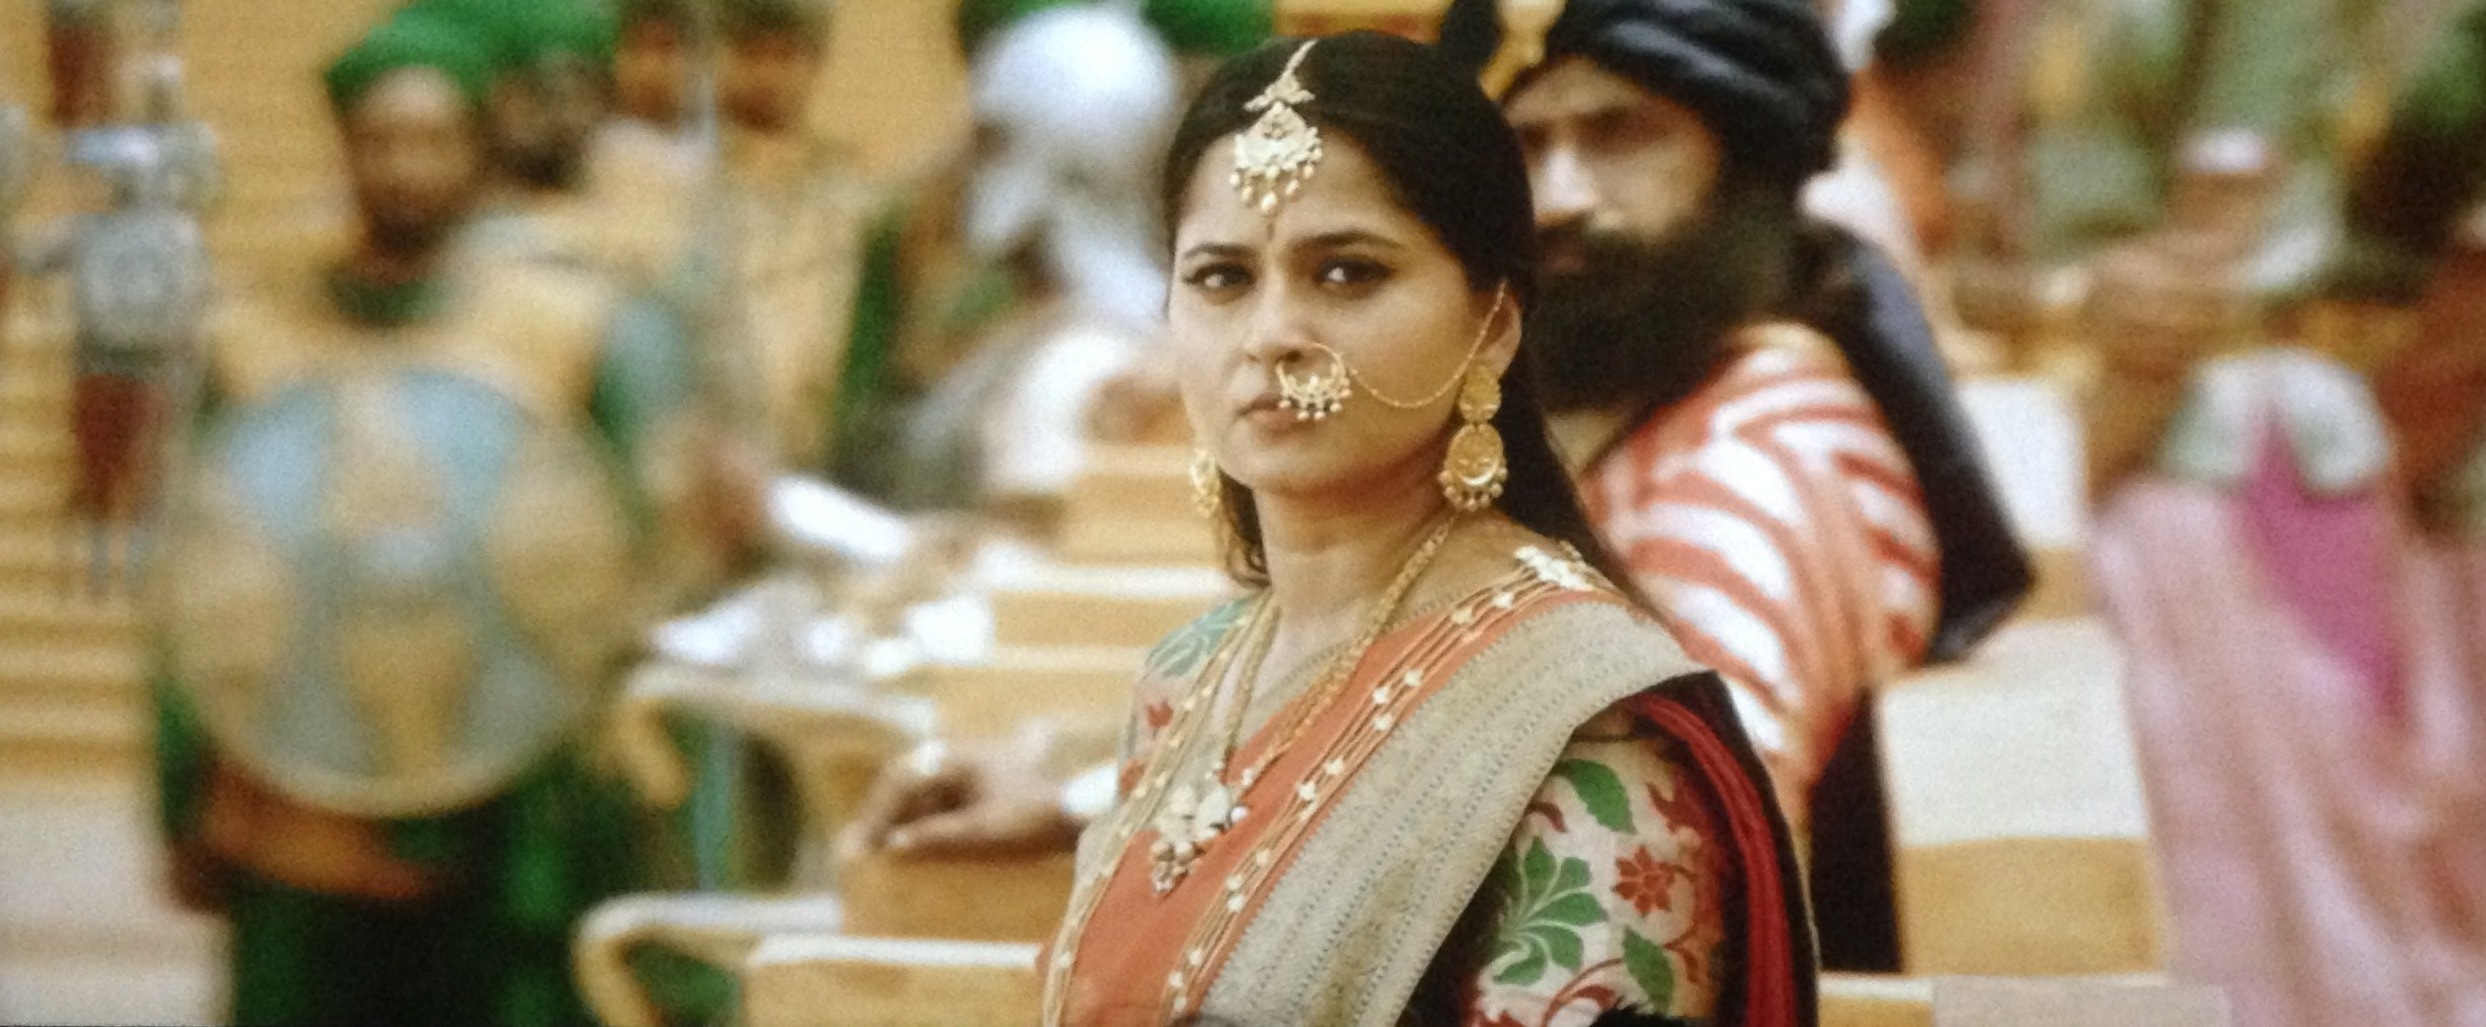 Anushka Shetty in bahubali 2 The conclusion, Anushka Shetty angry look in bahubali 2